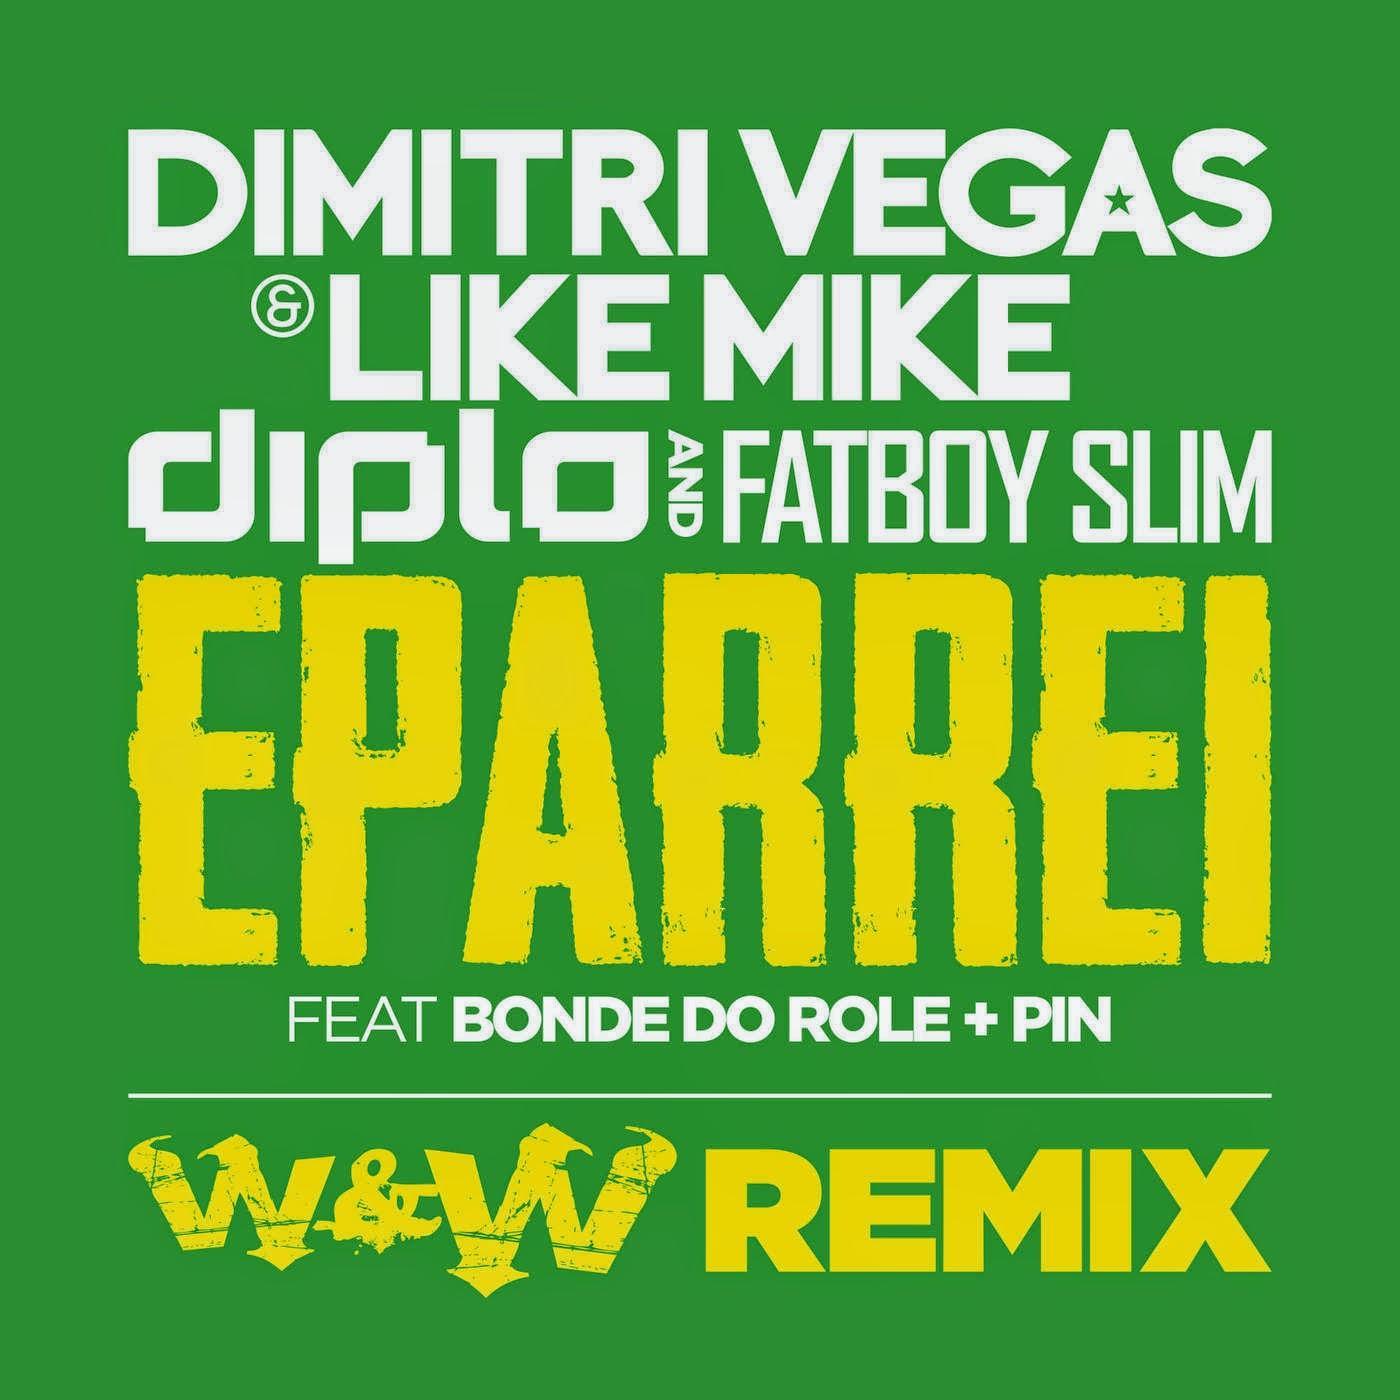 Dimitri Vegas, Like Mike, Diplo & Fatboy Slim - Eparrei (feat. Bonde Do Role & Pin) [W&W Remix] - Single Cover